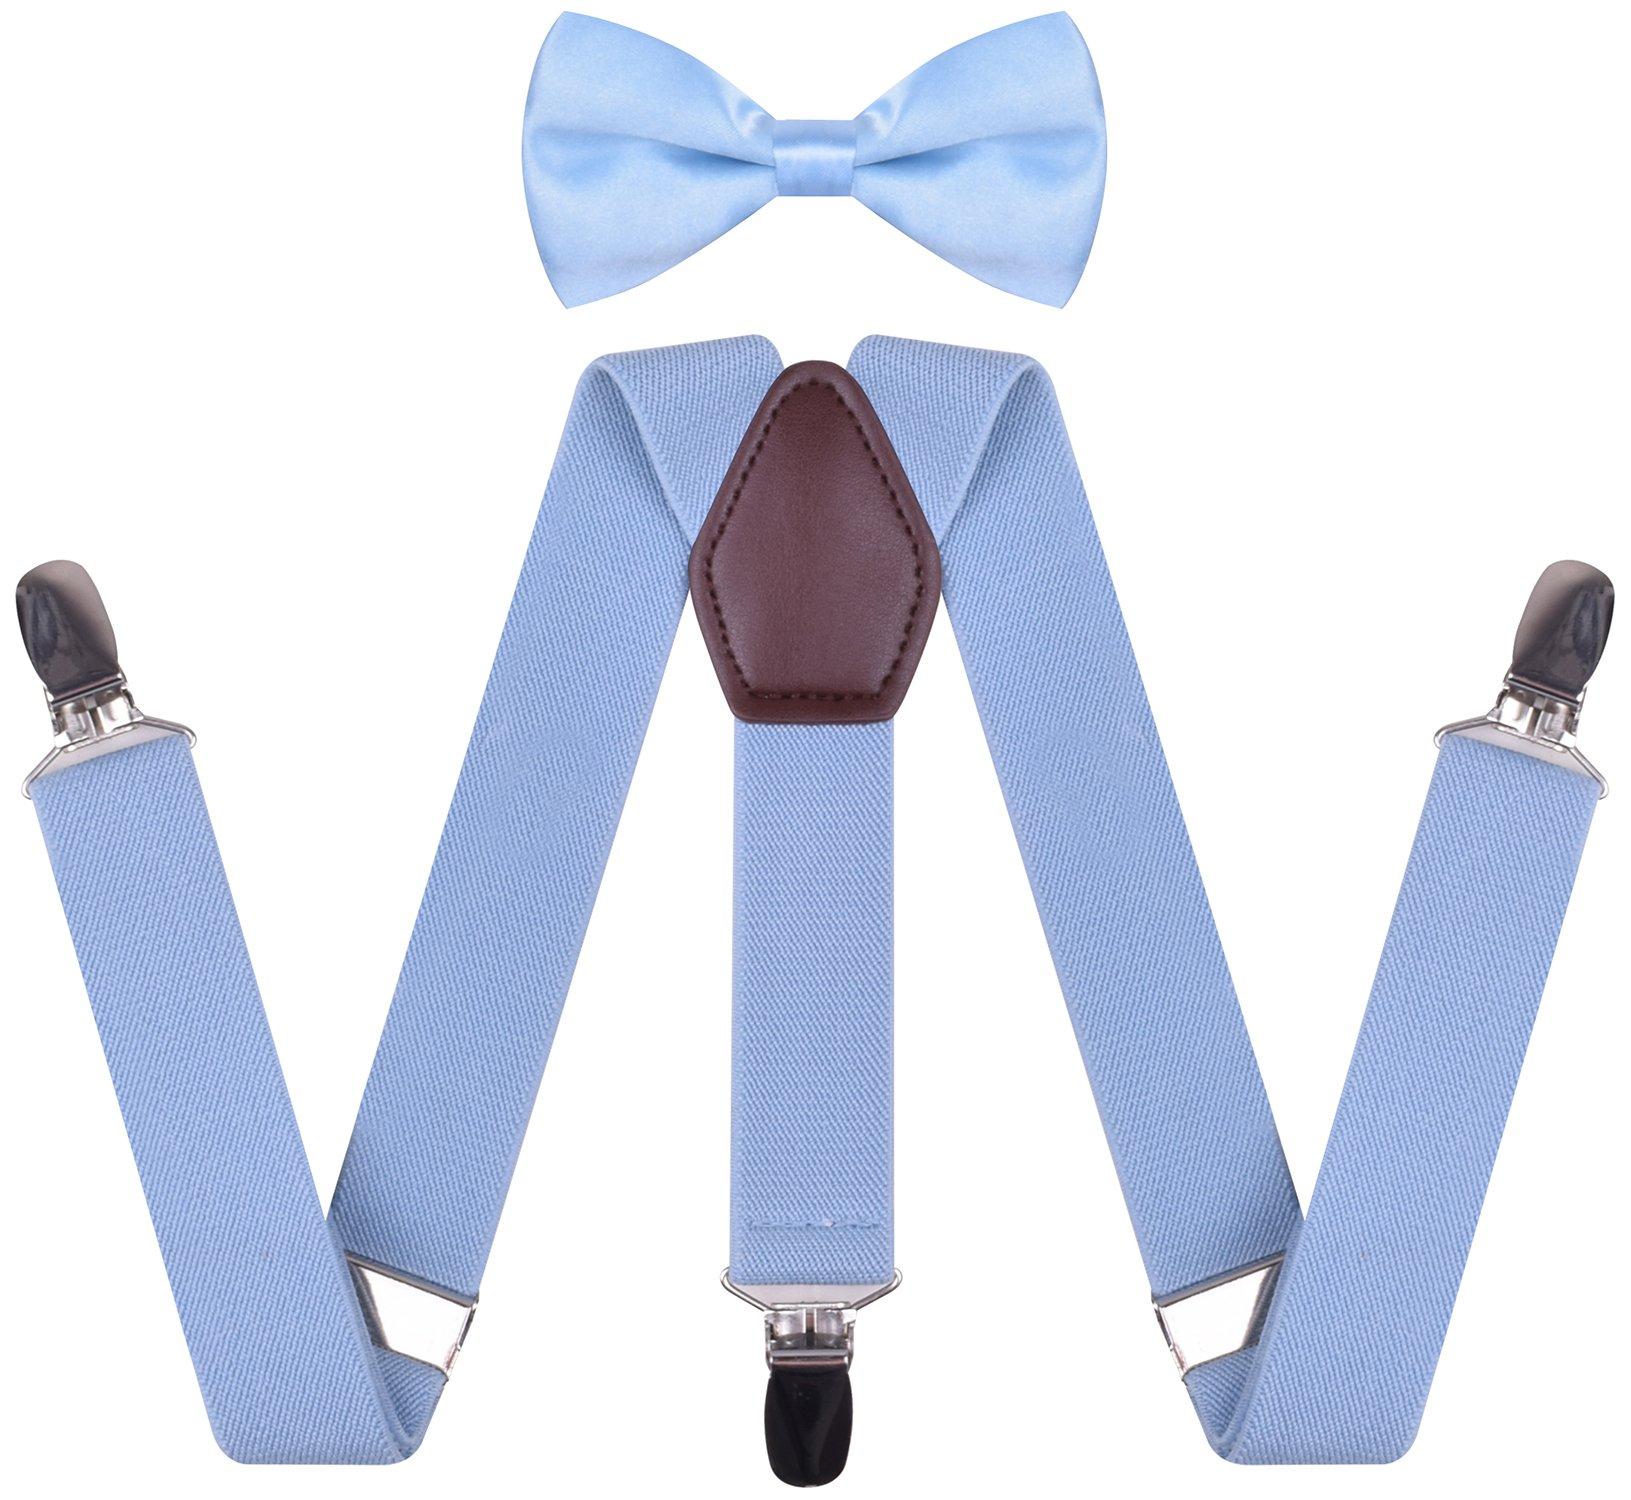 Suspender and Bowtie Set for Men Y Shape Womens Braces Suspenders on Jeans,Light Blue,Mens 50 Inches